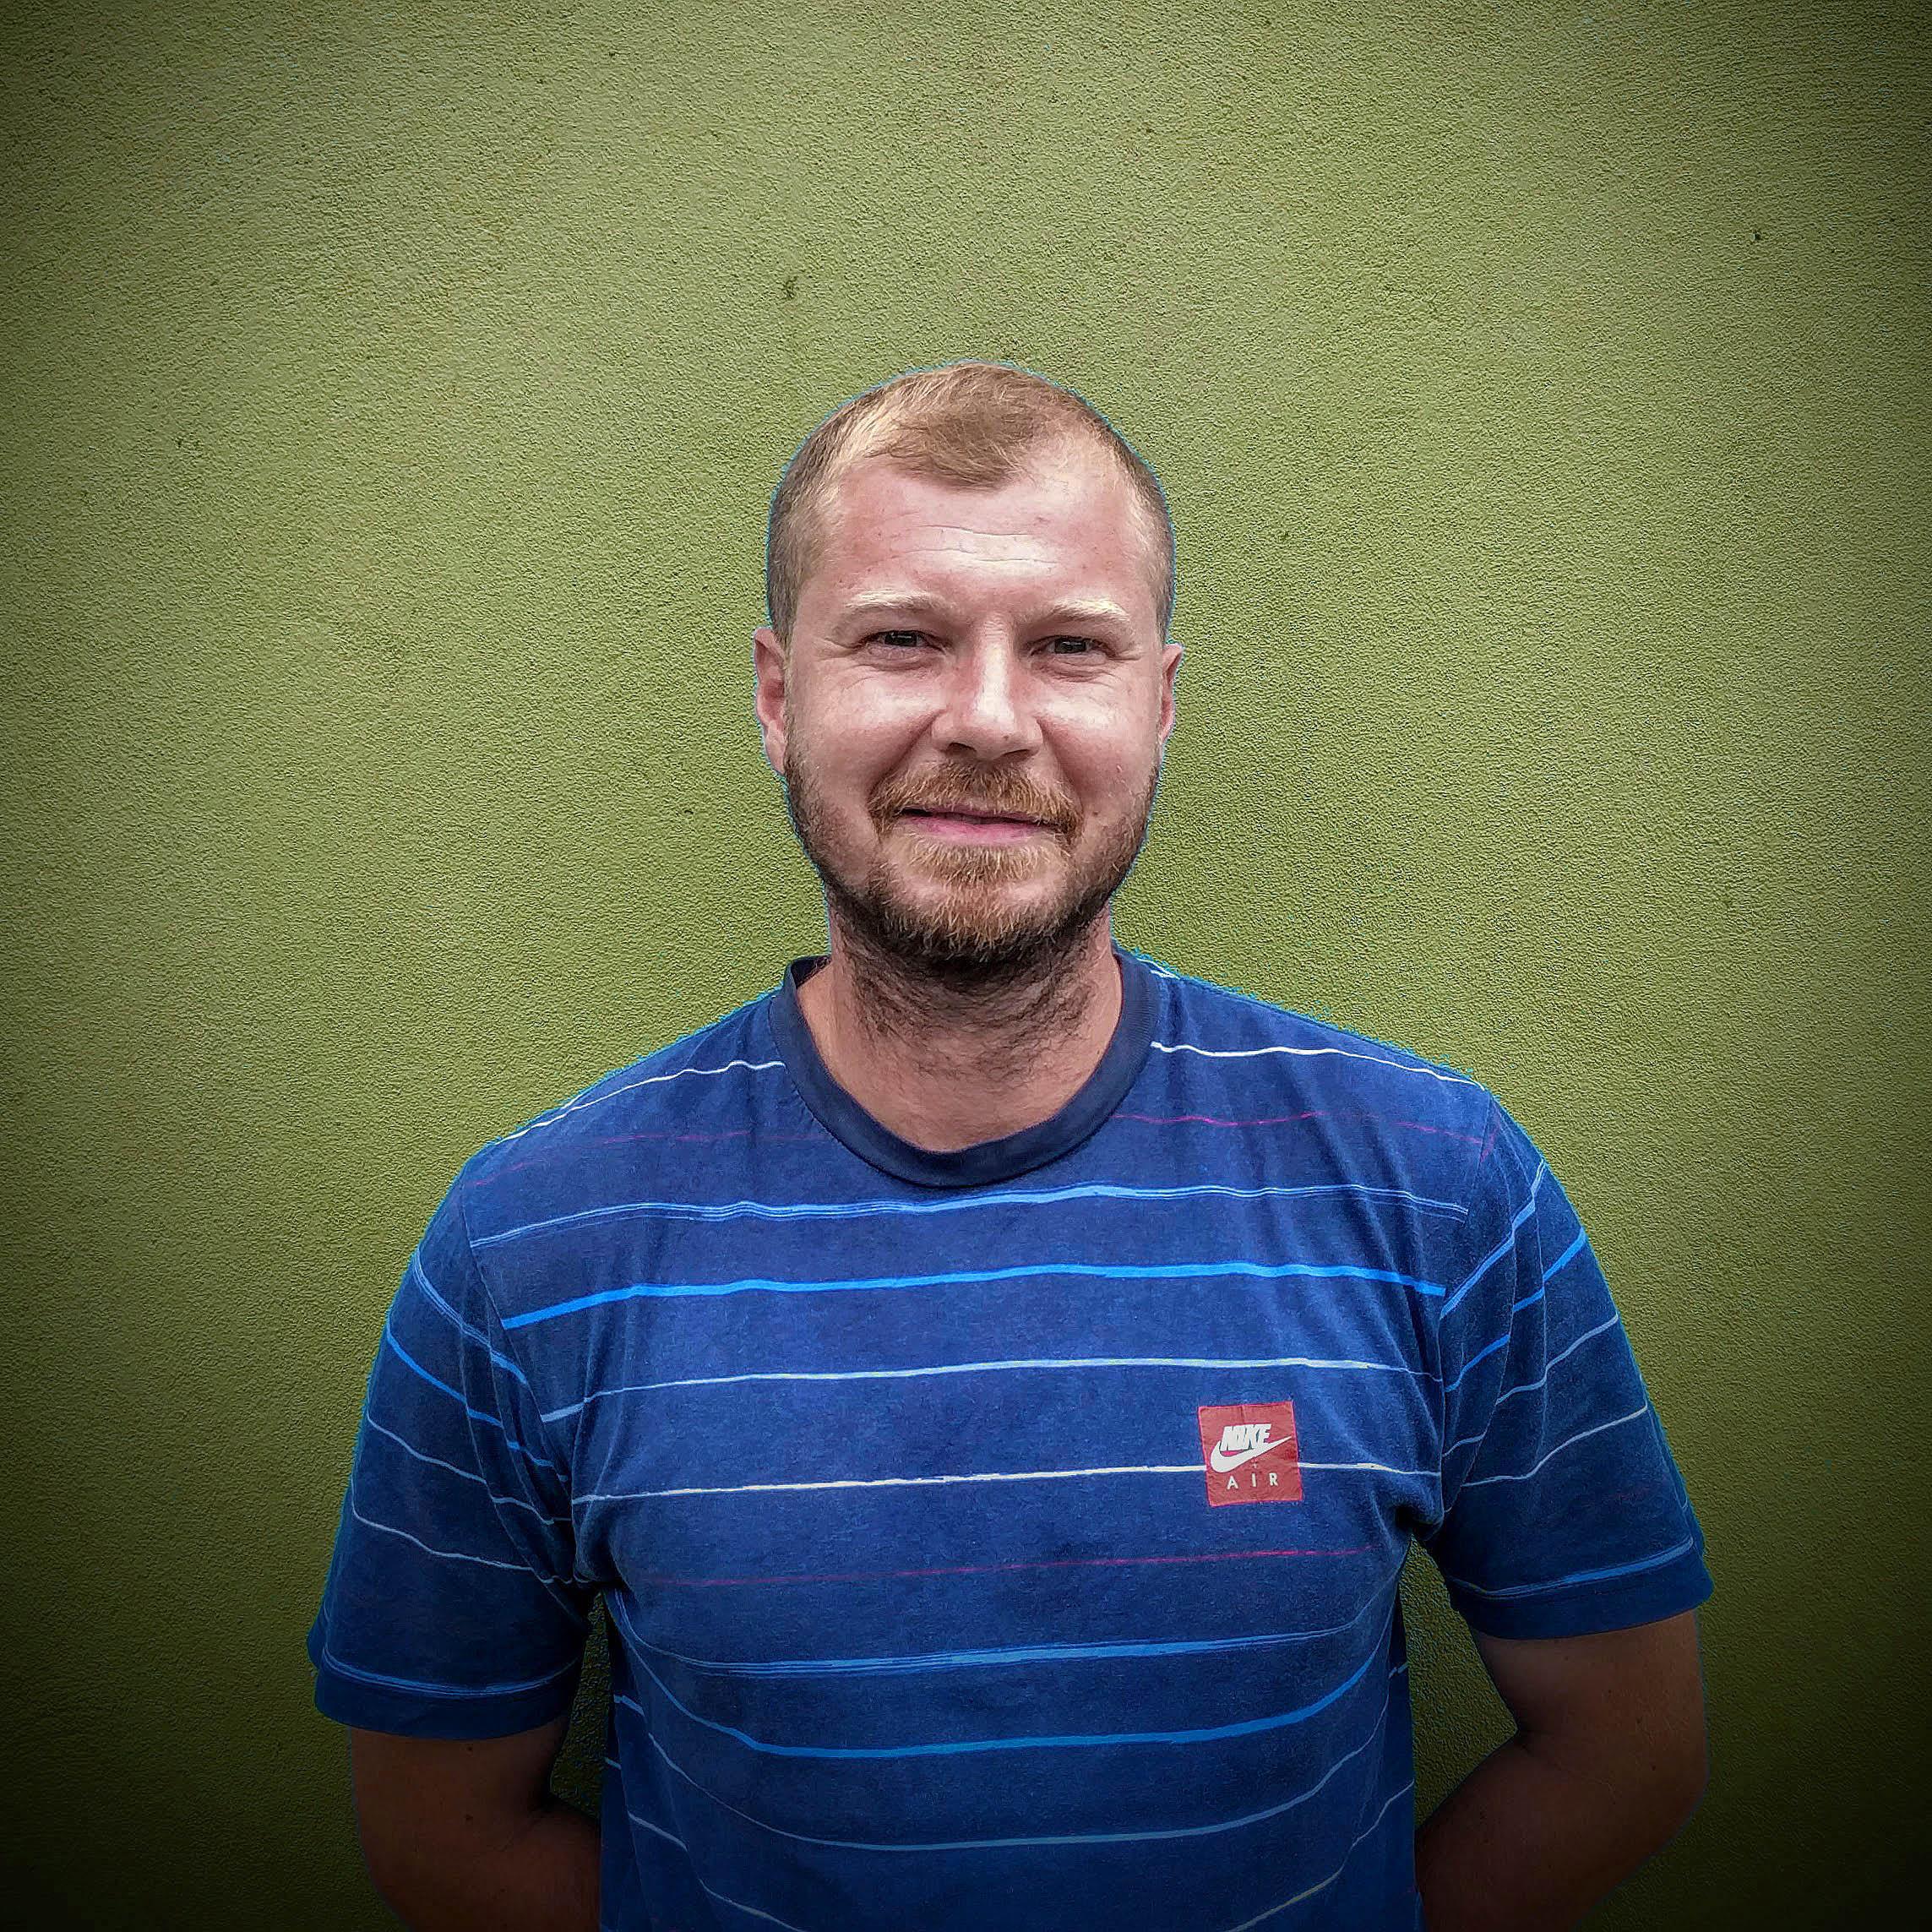 Piotr - Level 3 Tennis Coach, Tennis specialist